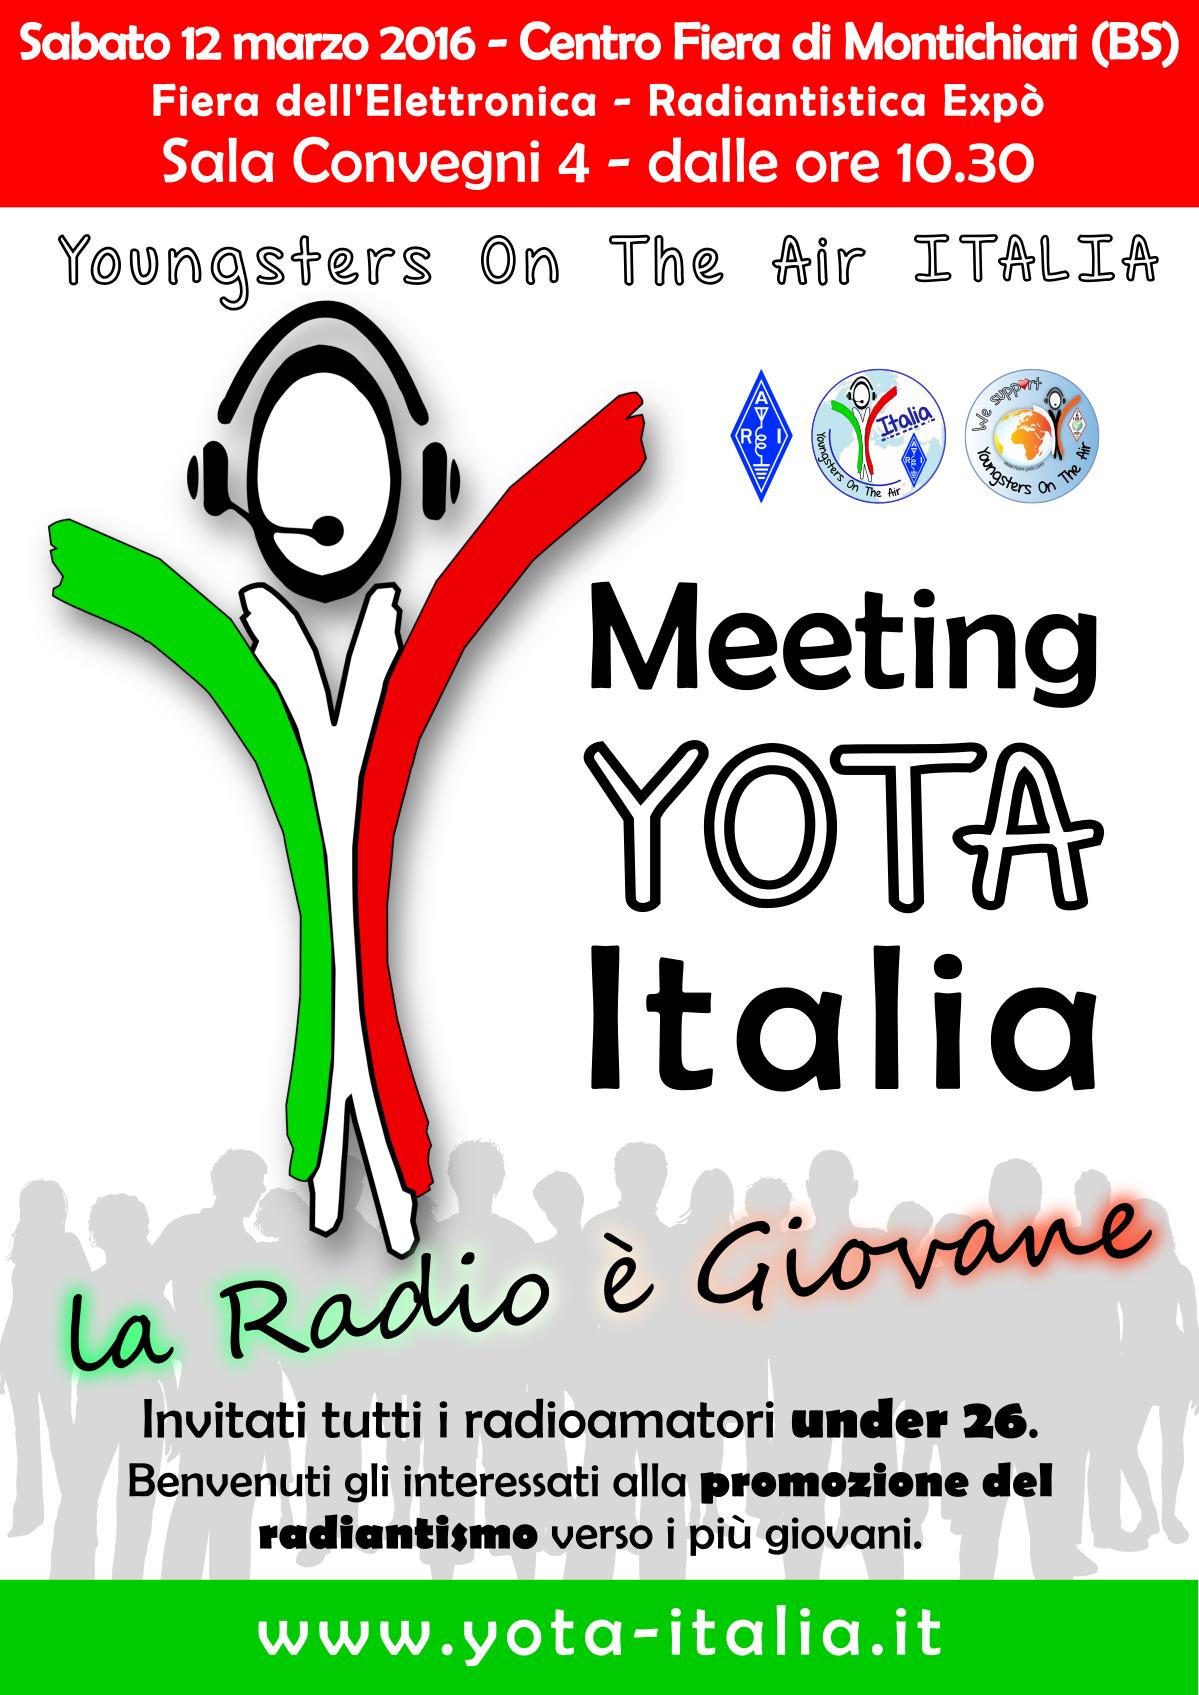 Meeting YOTA Italia – la Radio è Giovane